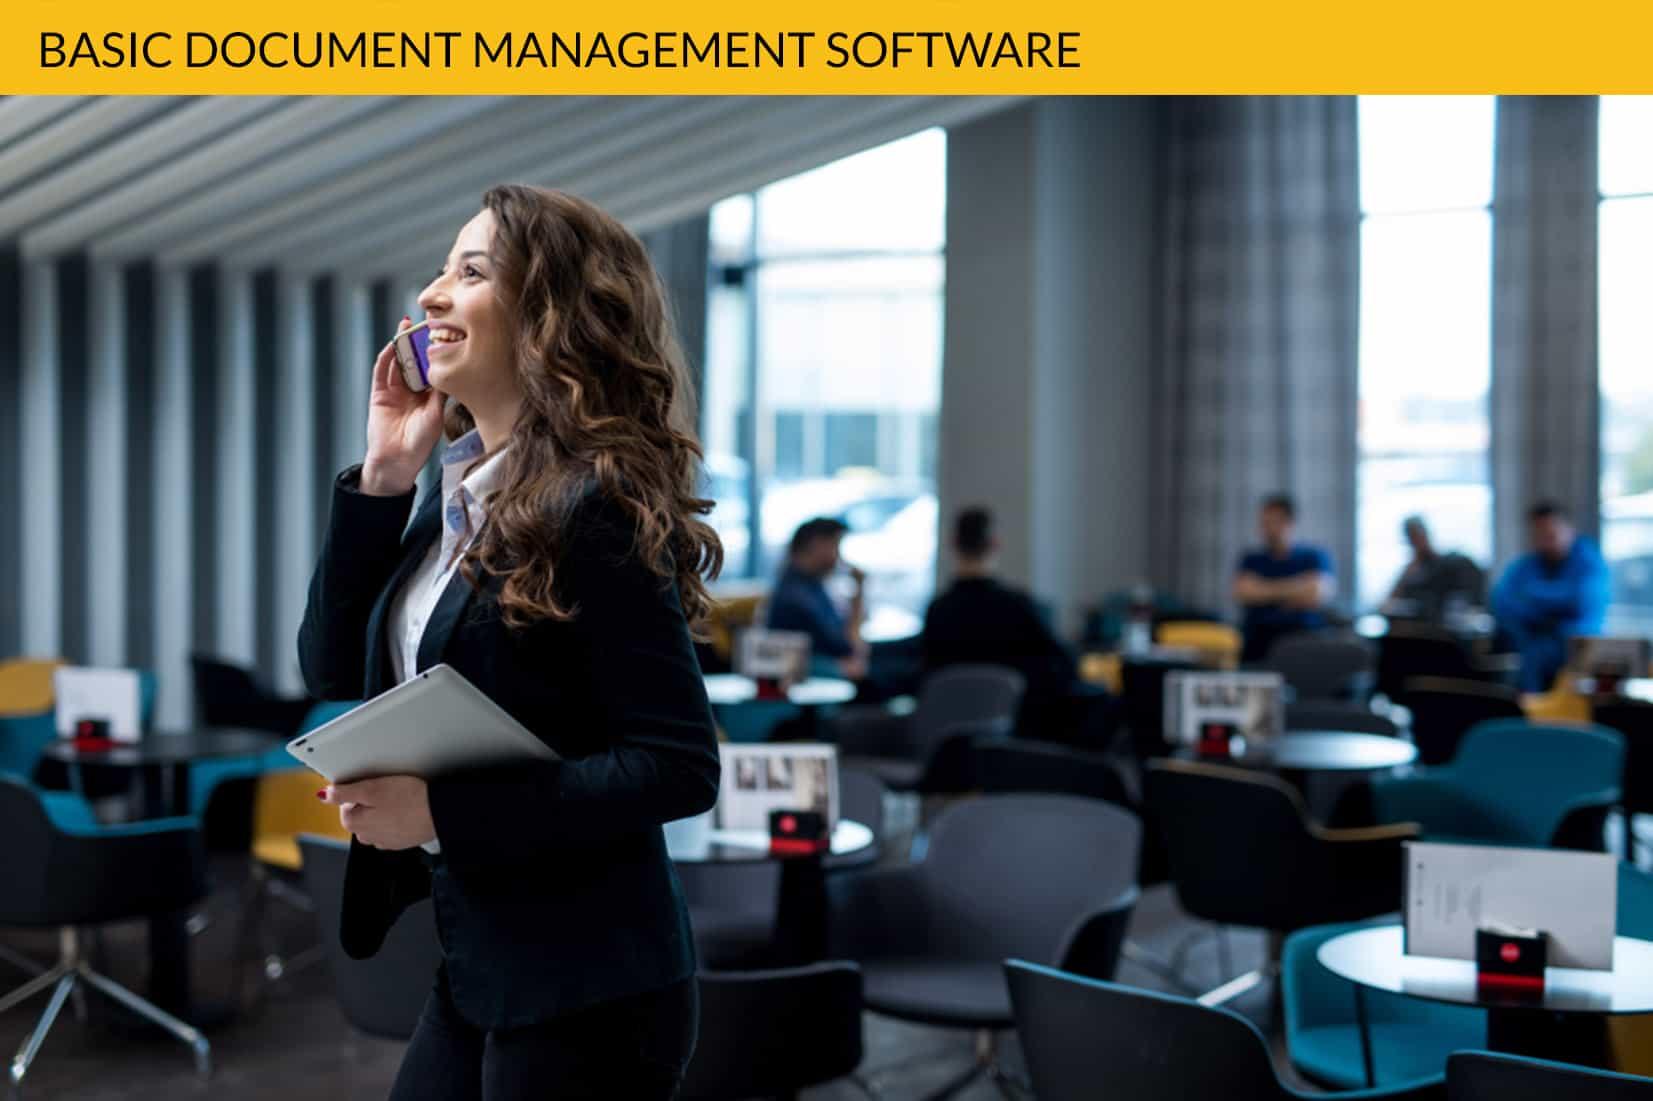 Basic Document Management Software